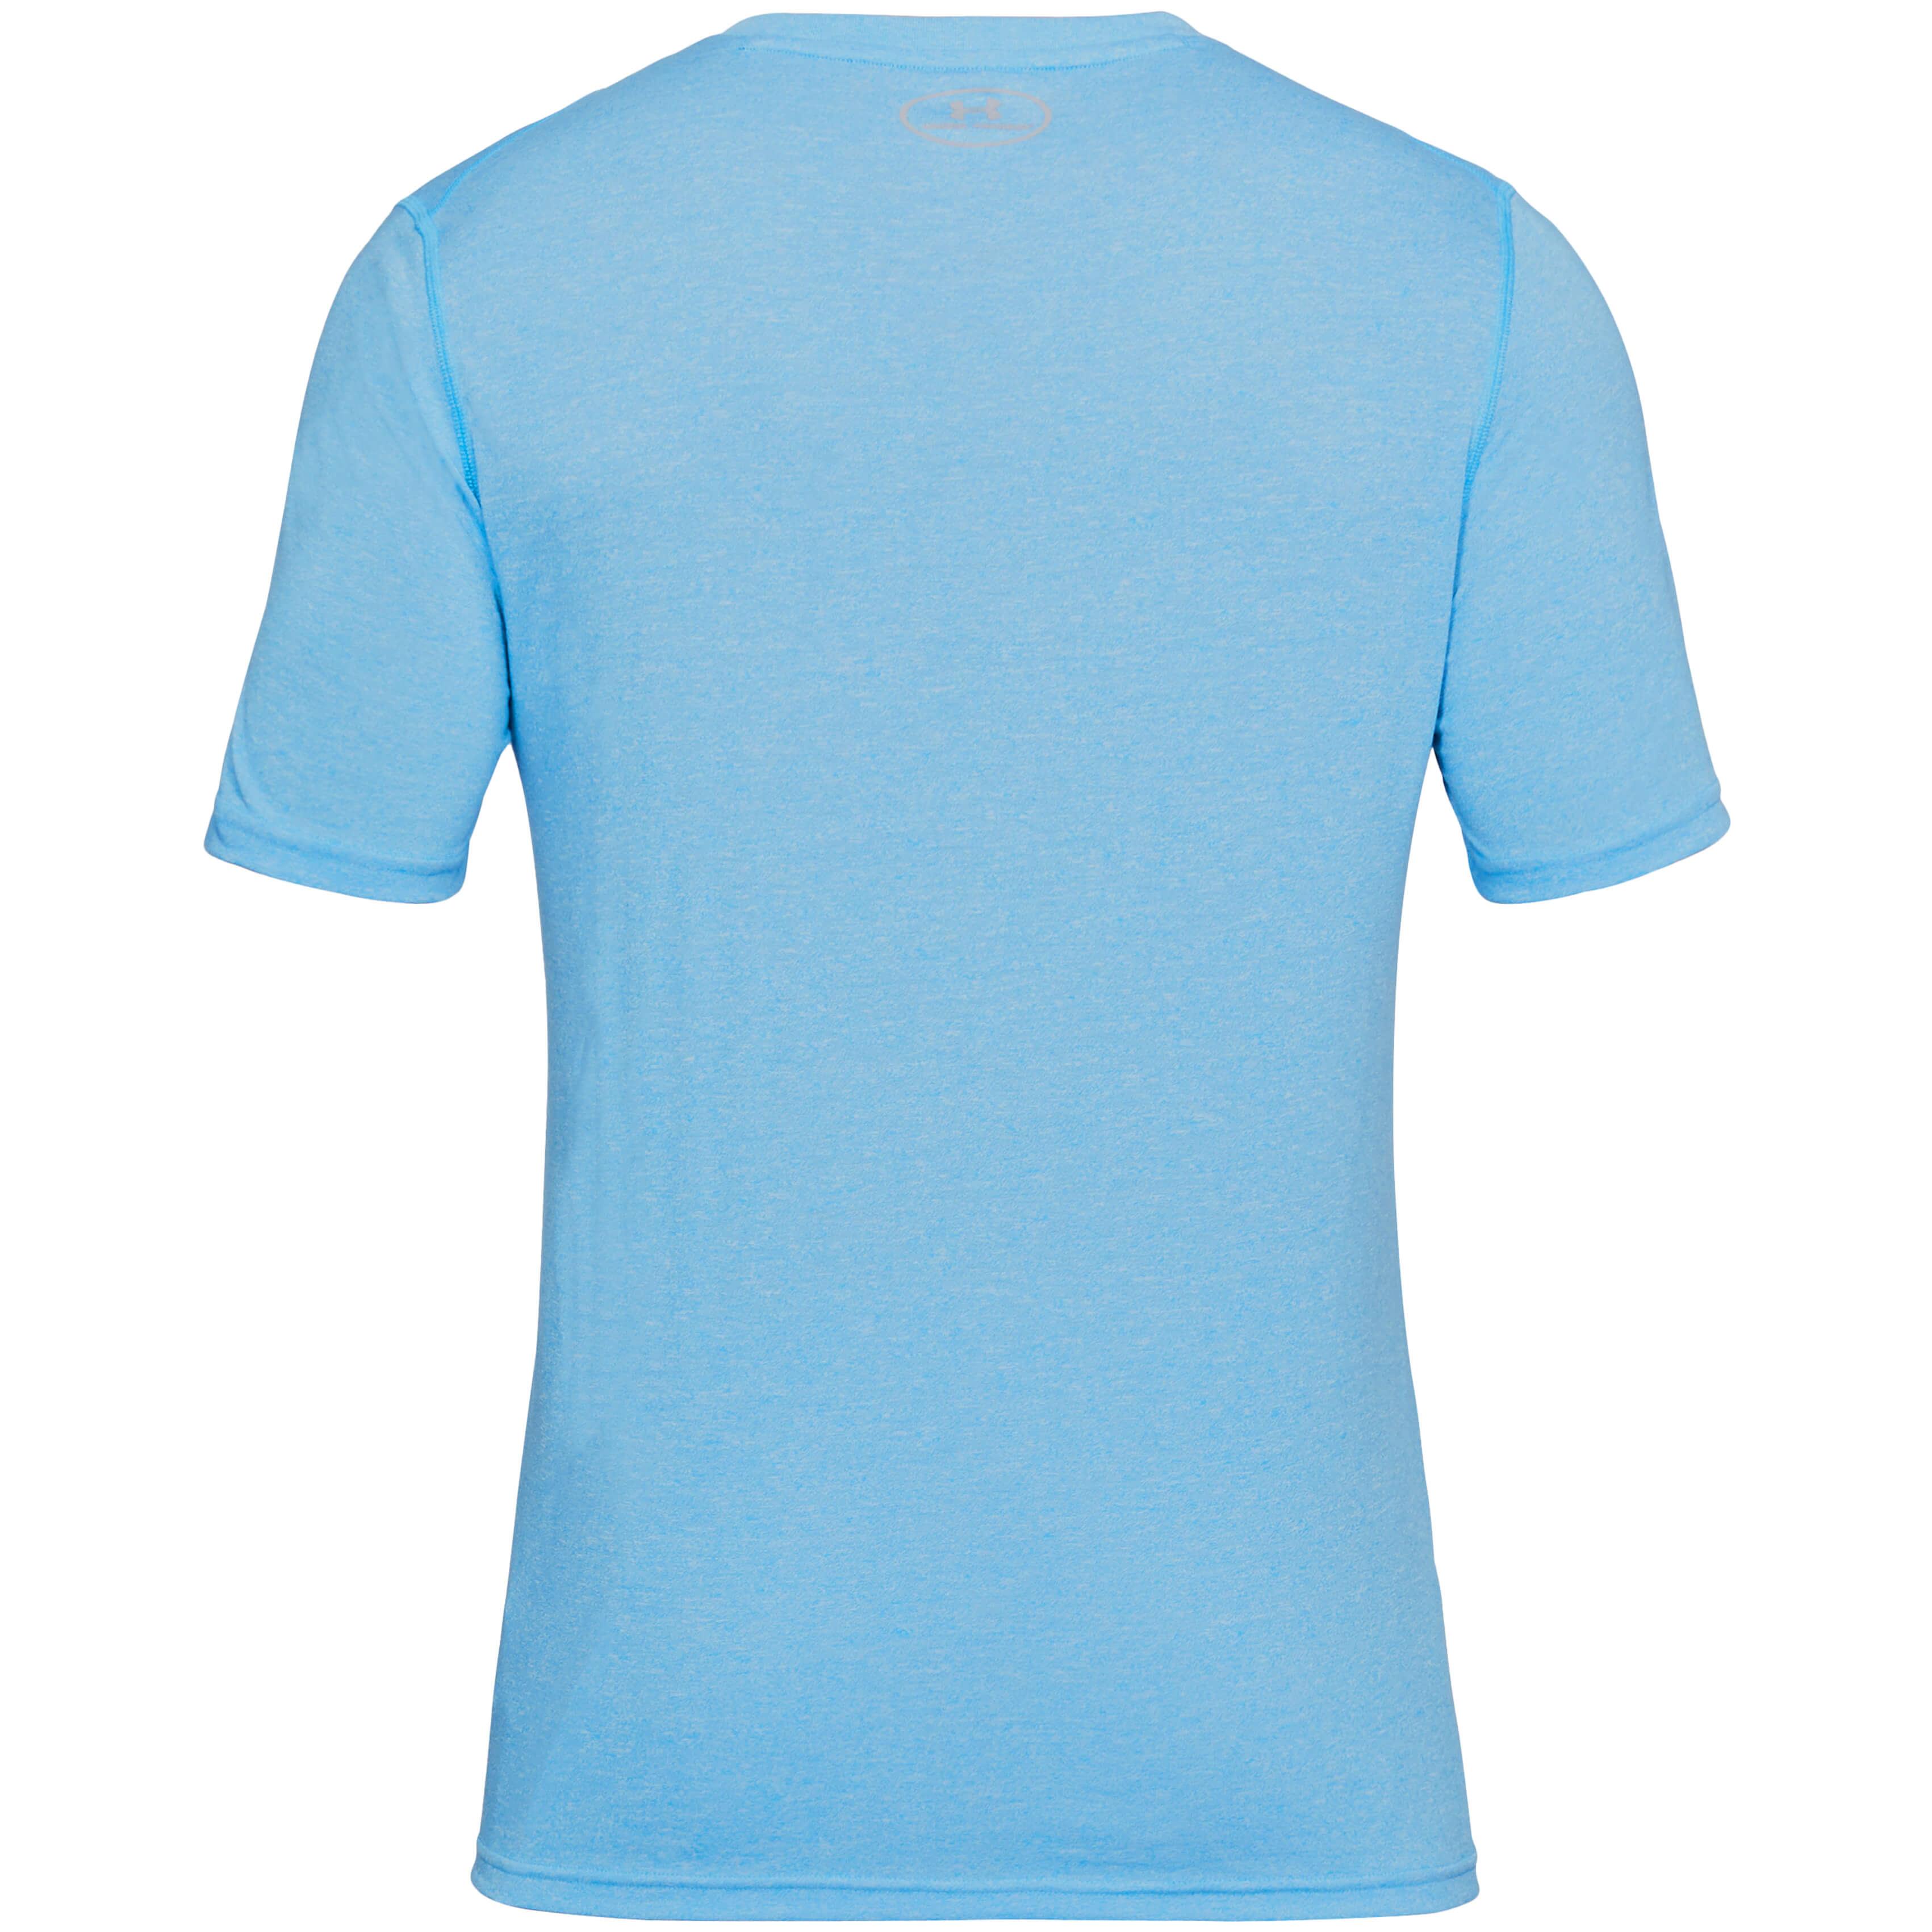 Under-Armour-Mens-UA-Threadborne-Fitted-Short-Sleeve-Gym-Tee-Sport-T-Shirt thumbnail 14